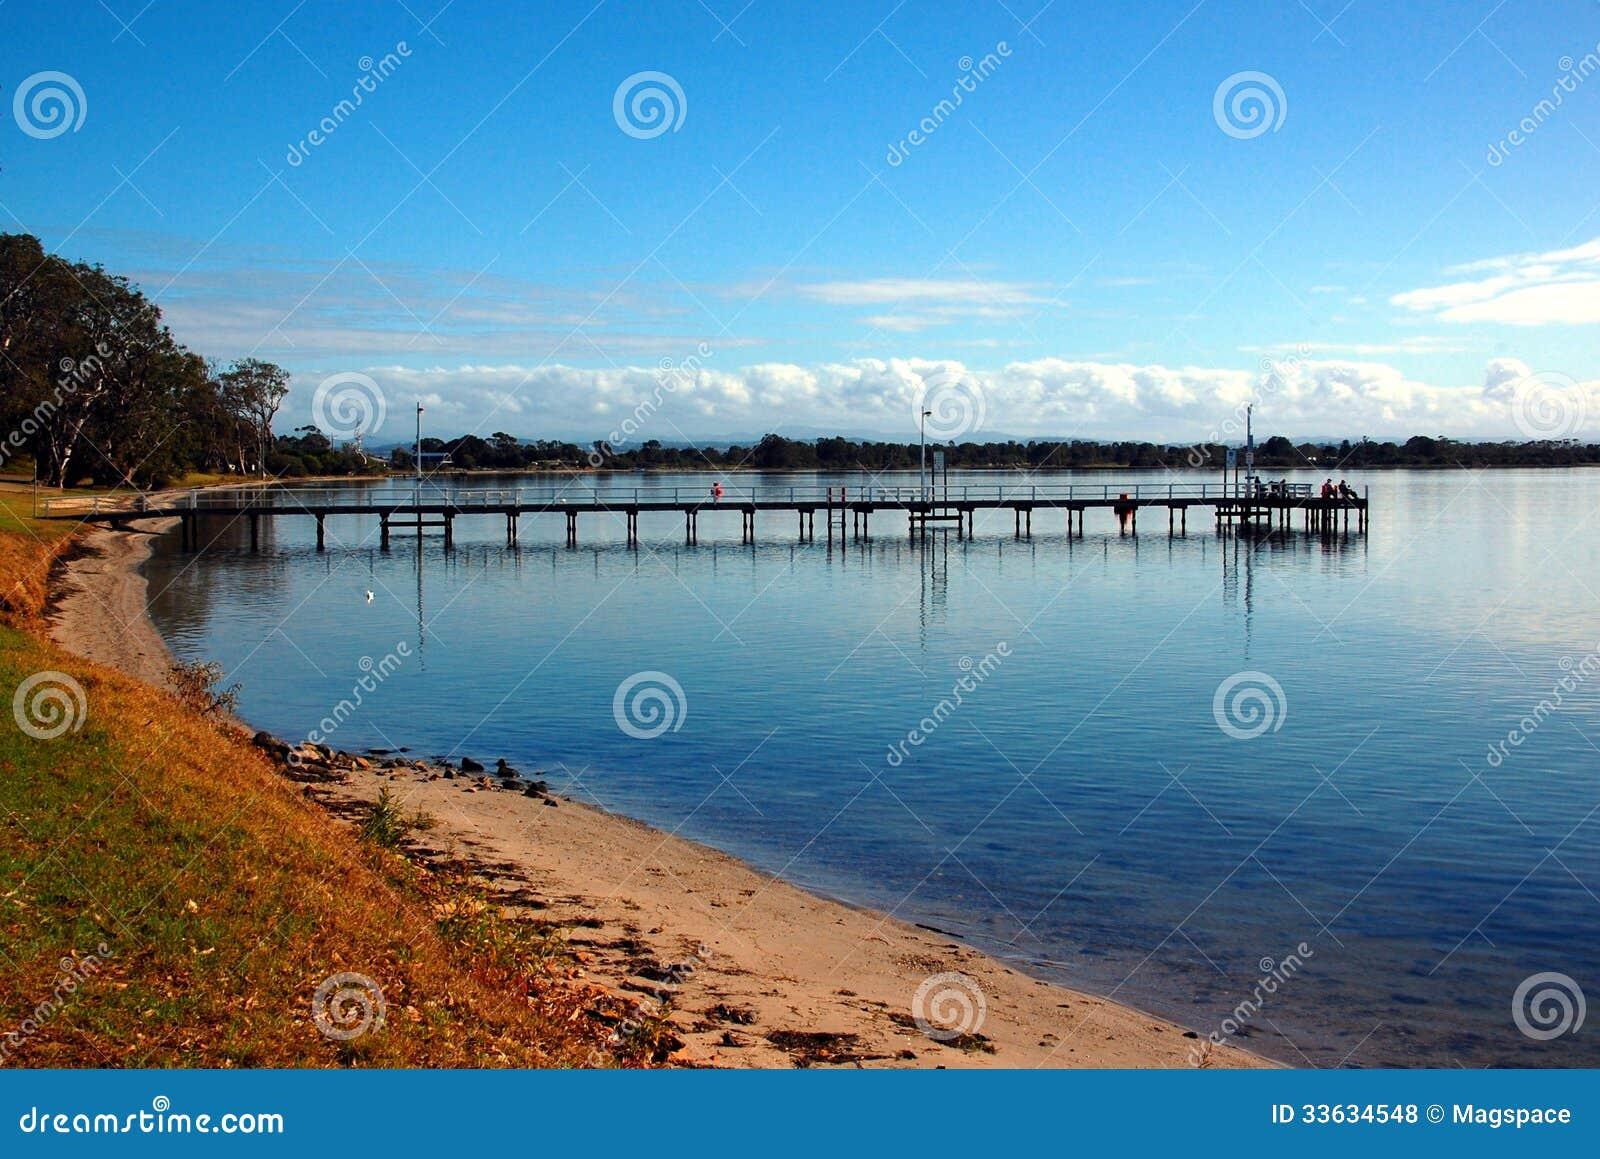 Fishing Pier, Eagle Point, Small Town In Victoria, Australia Stock